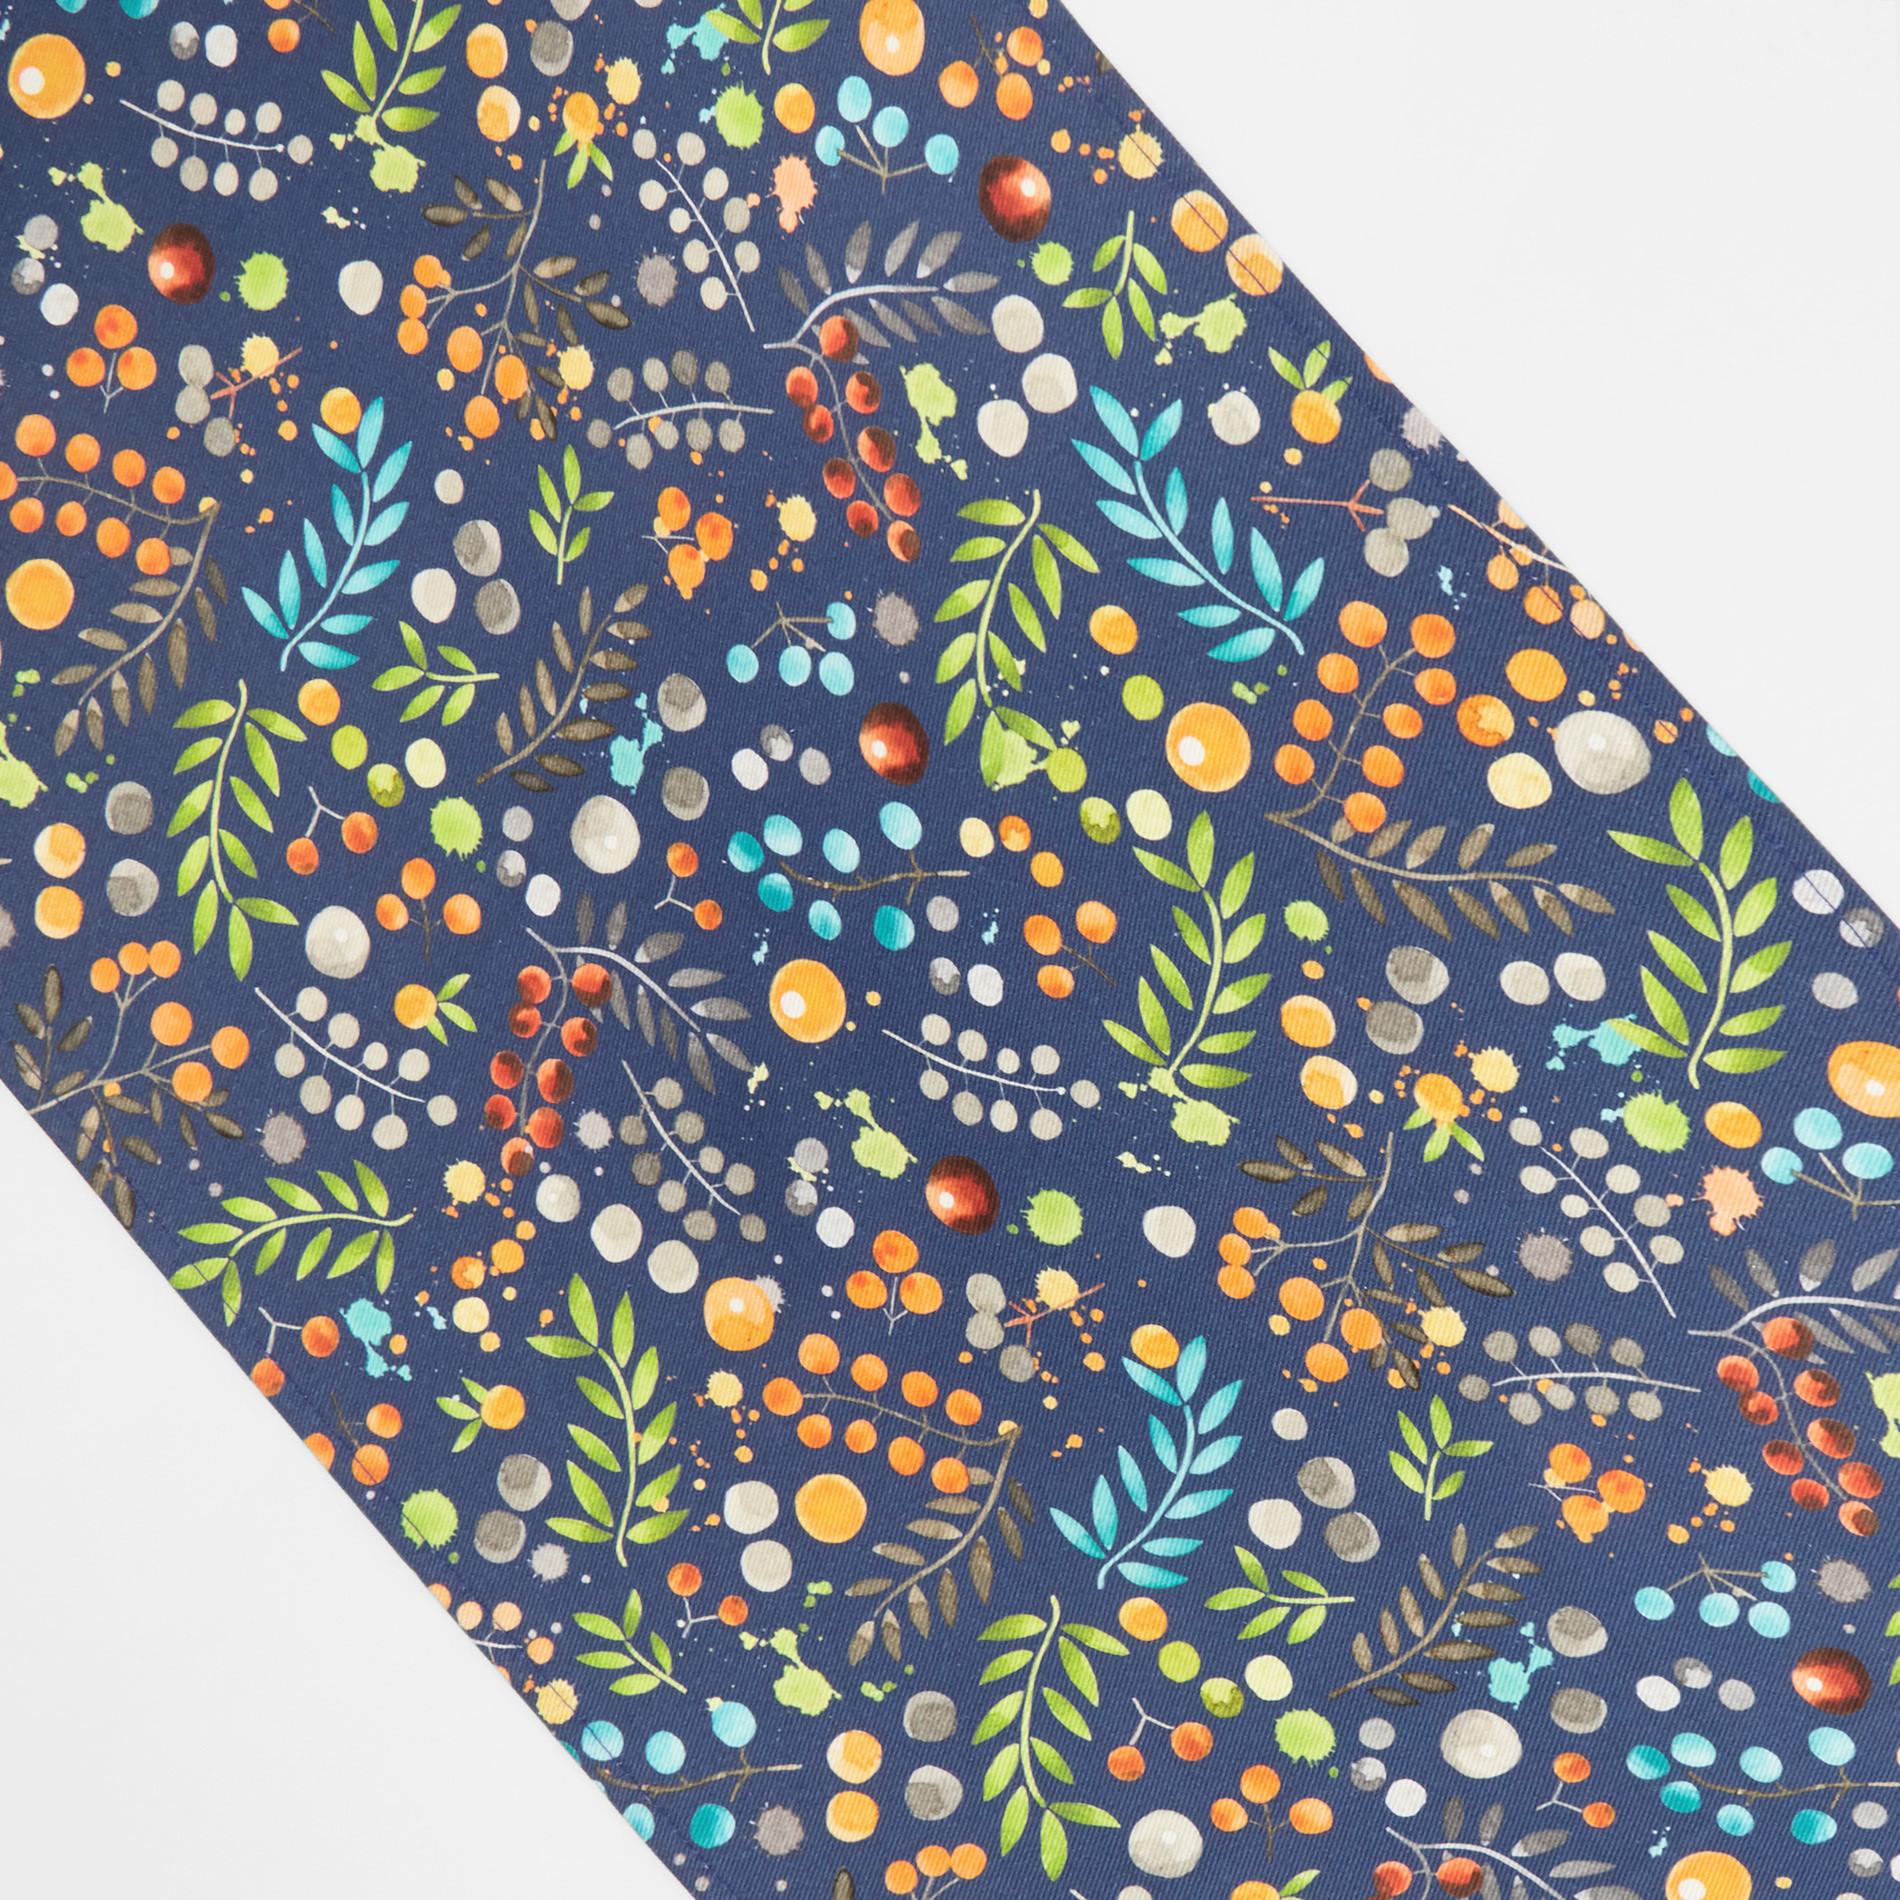 Runner twill di cotone idrorepellente stampa fiori, Blu, large image number 1